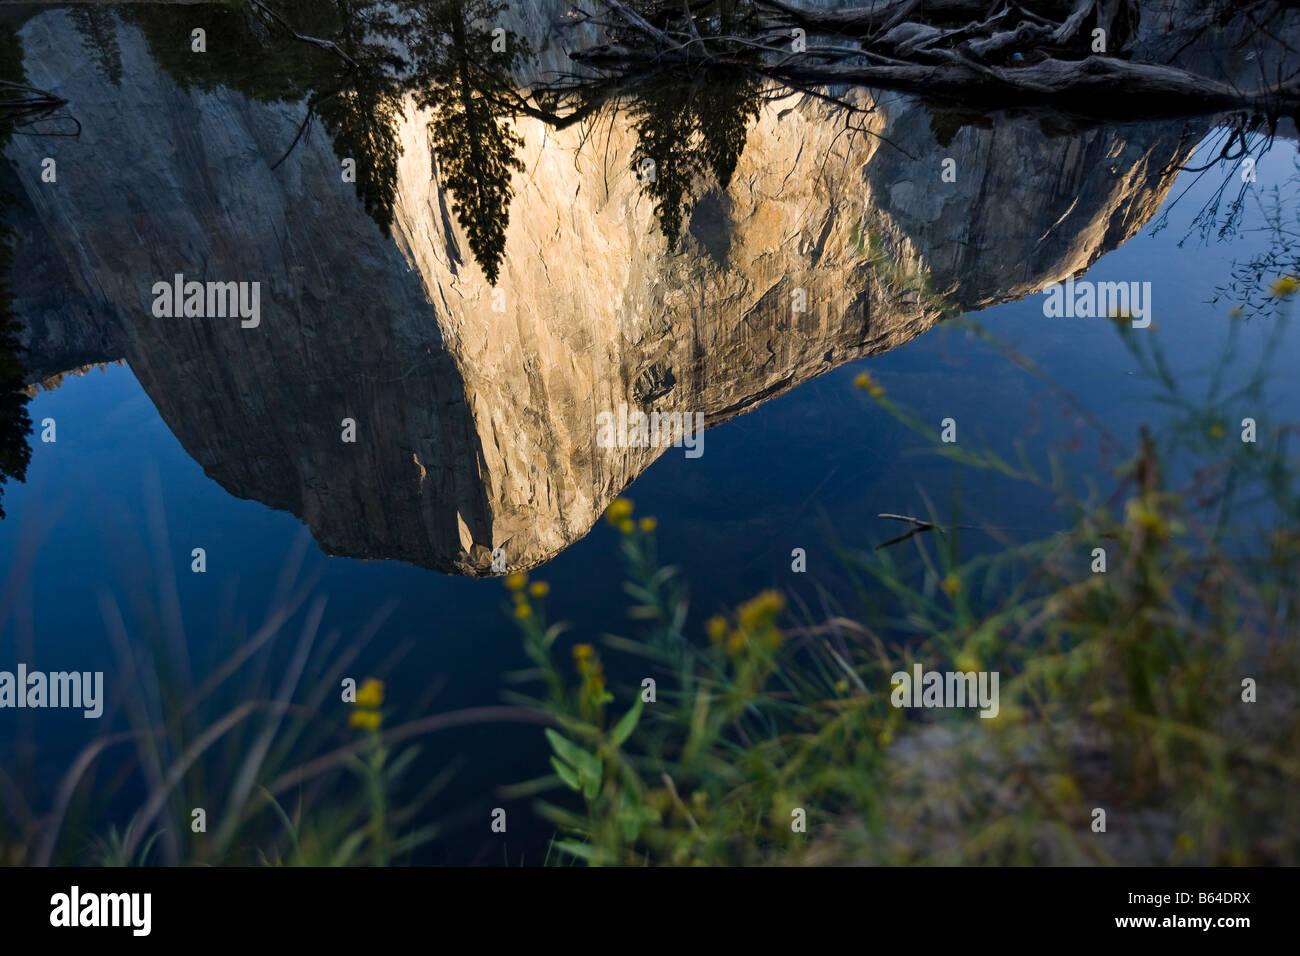 Yosemite National Park El Capitan Bridal Veil Falls sunrise rock climb climbing California, USA Stock Photo